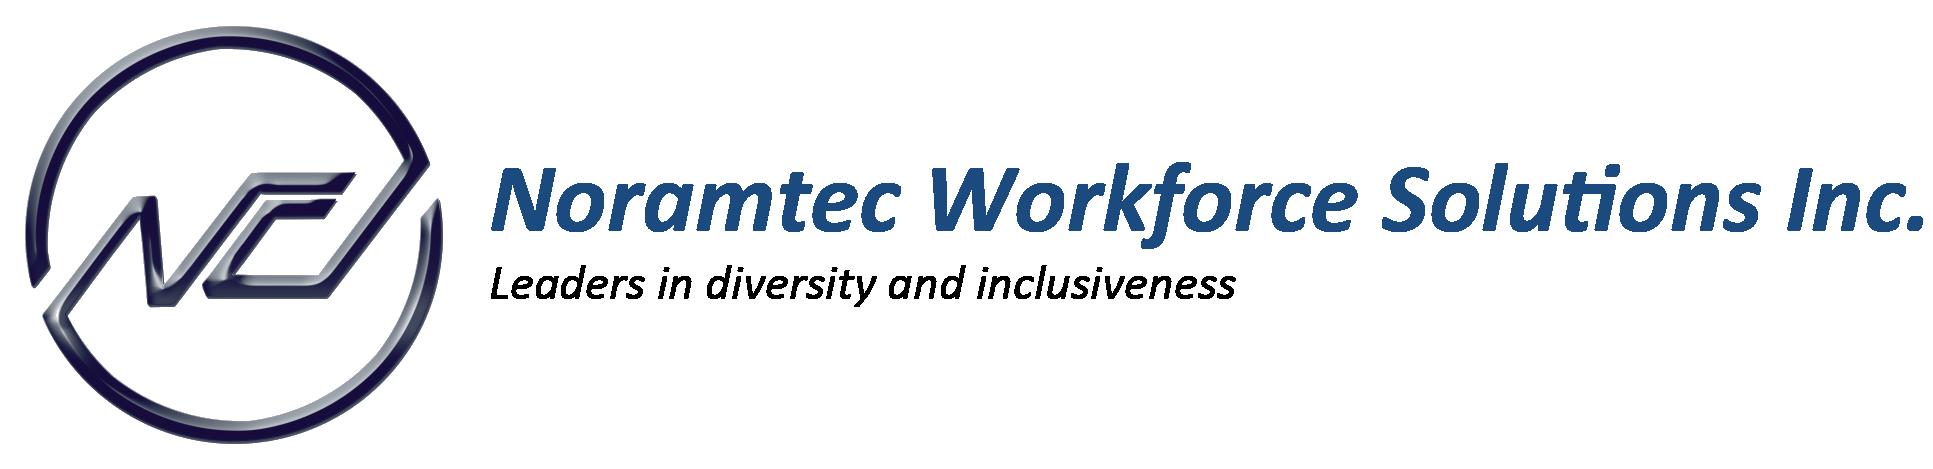 noramtec_workforce_solutions_logo_2019